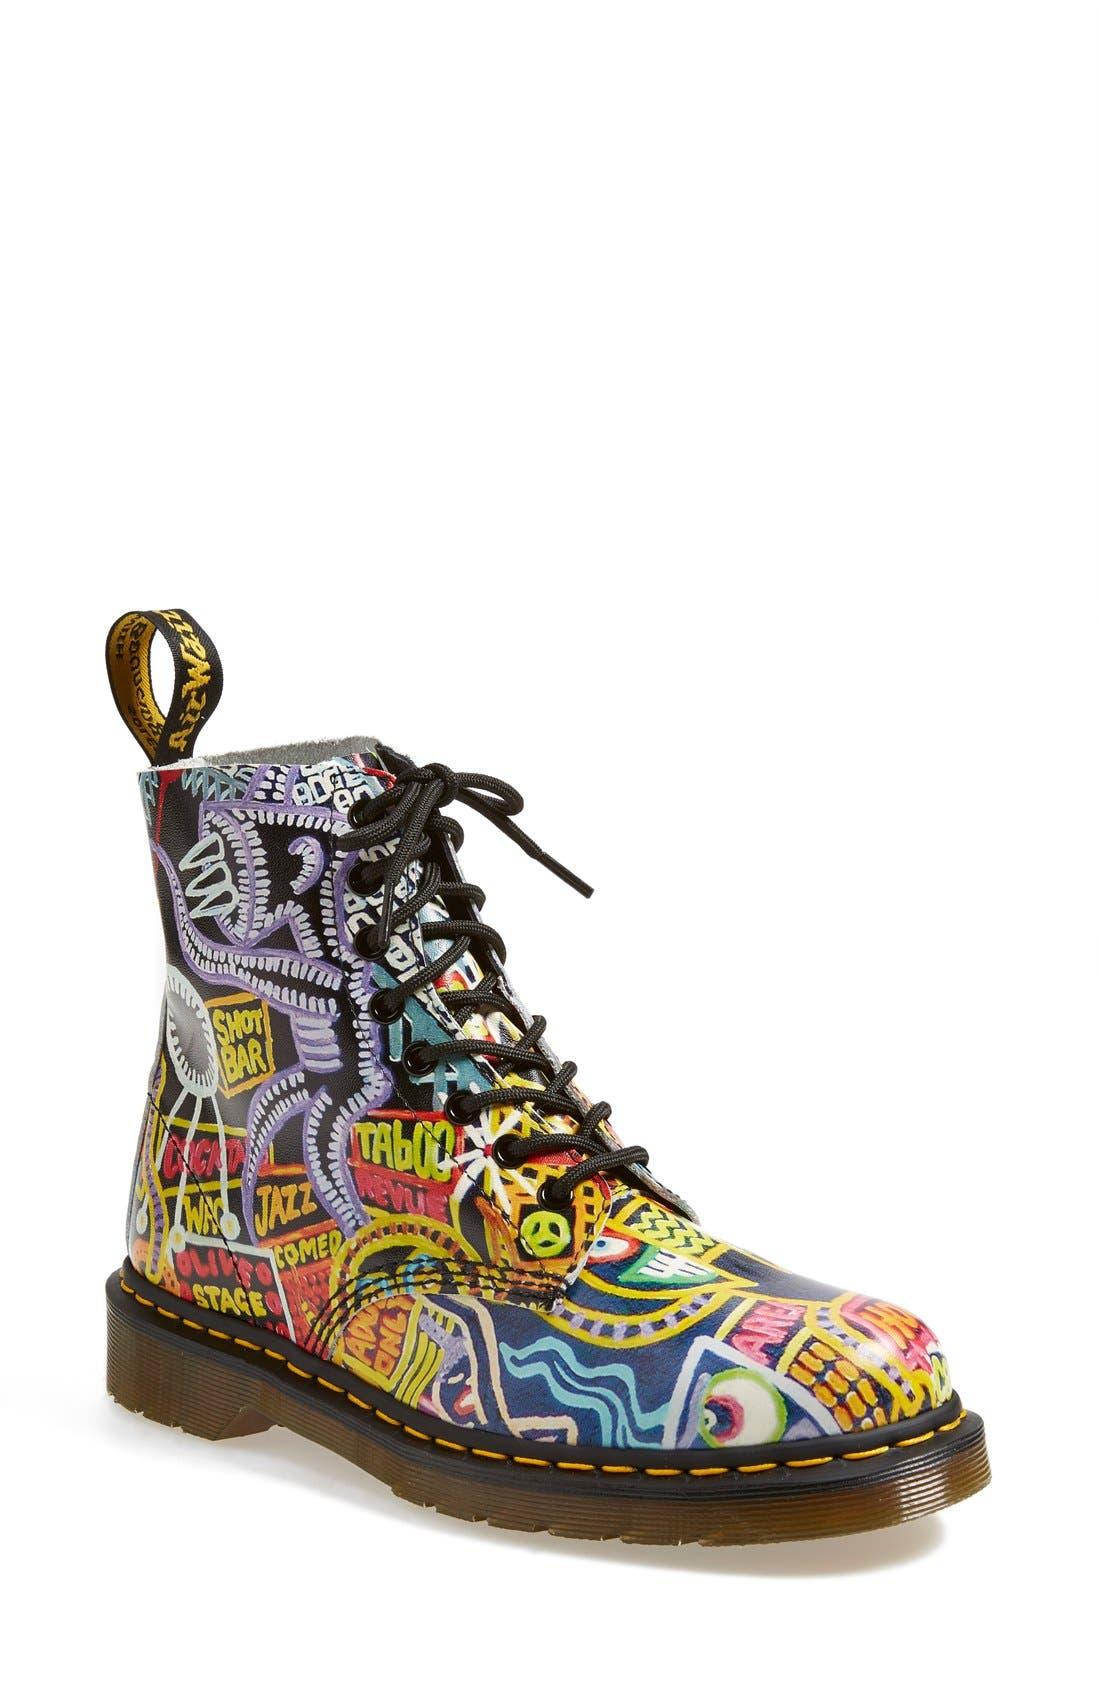 Alternate Image 1 Selected - Dr. Martens 'Pascal' MultiKaboom Print Boot (Women)